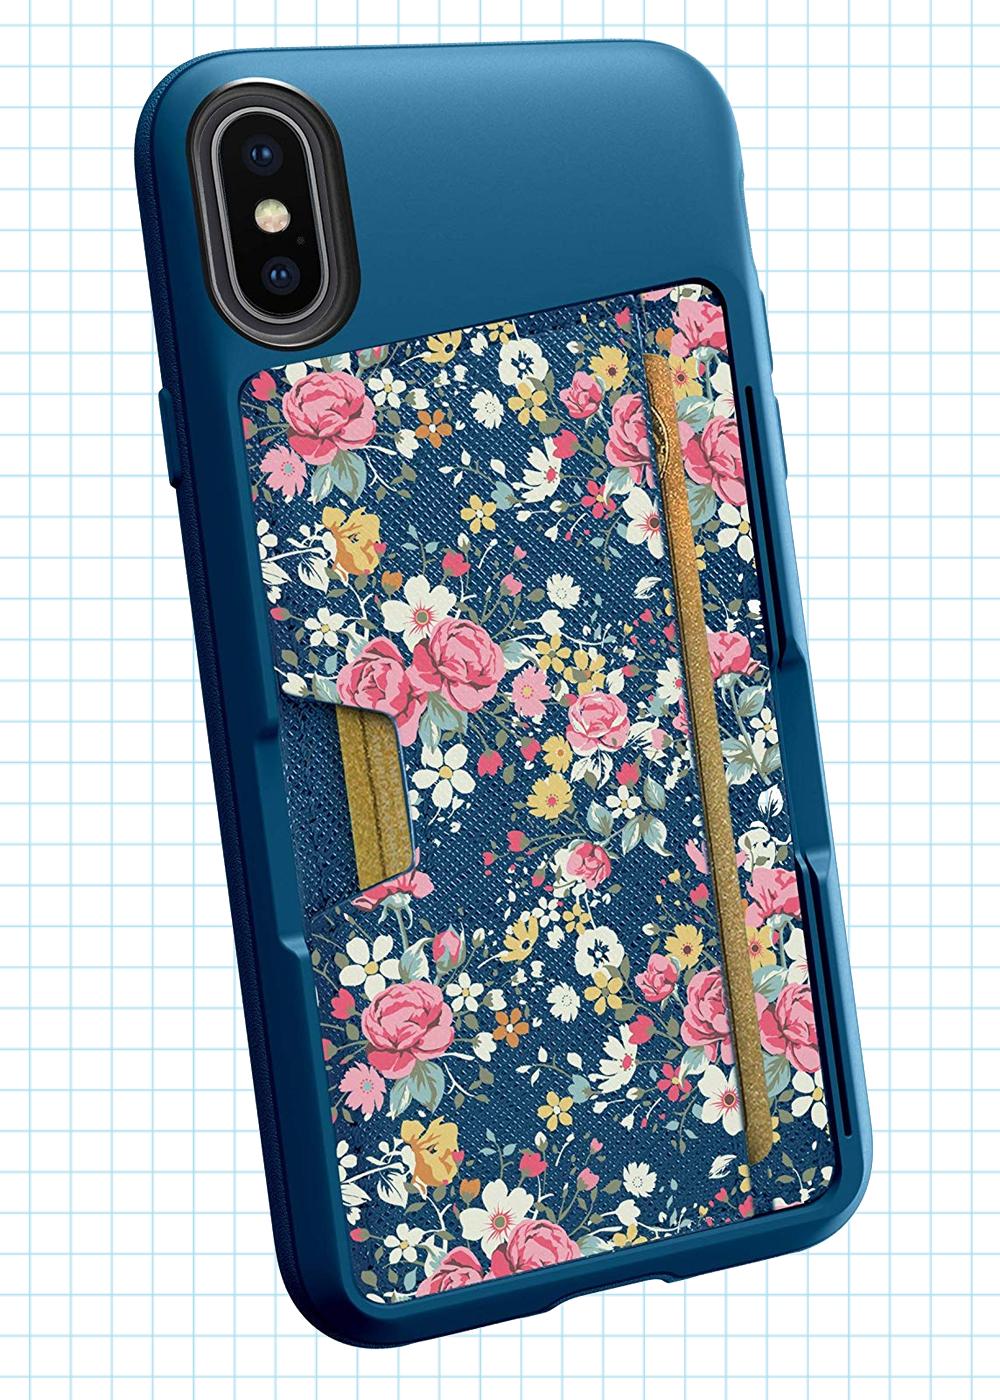 top 10 cover iphone 6s cute girls ideas